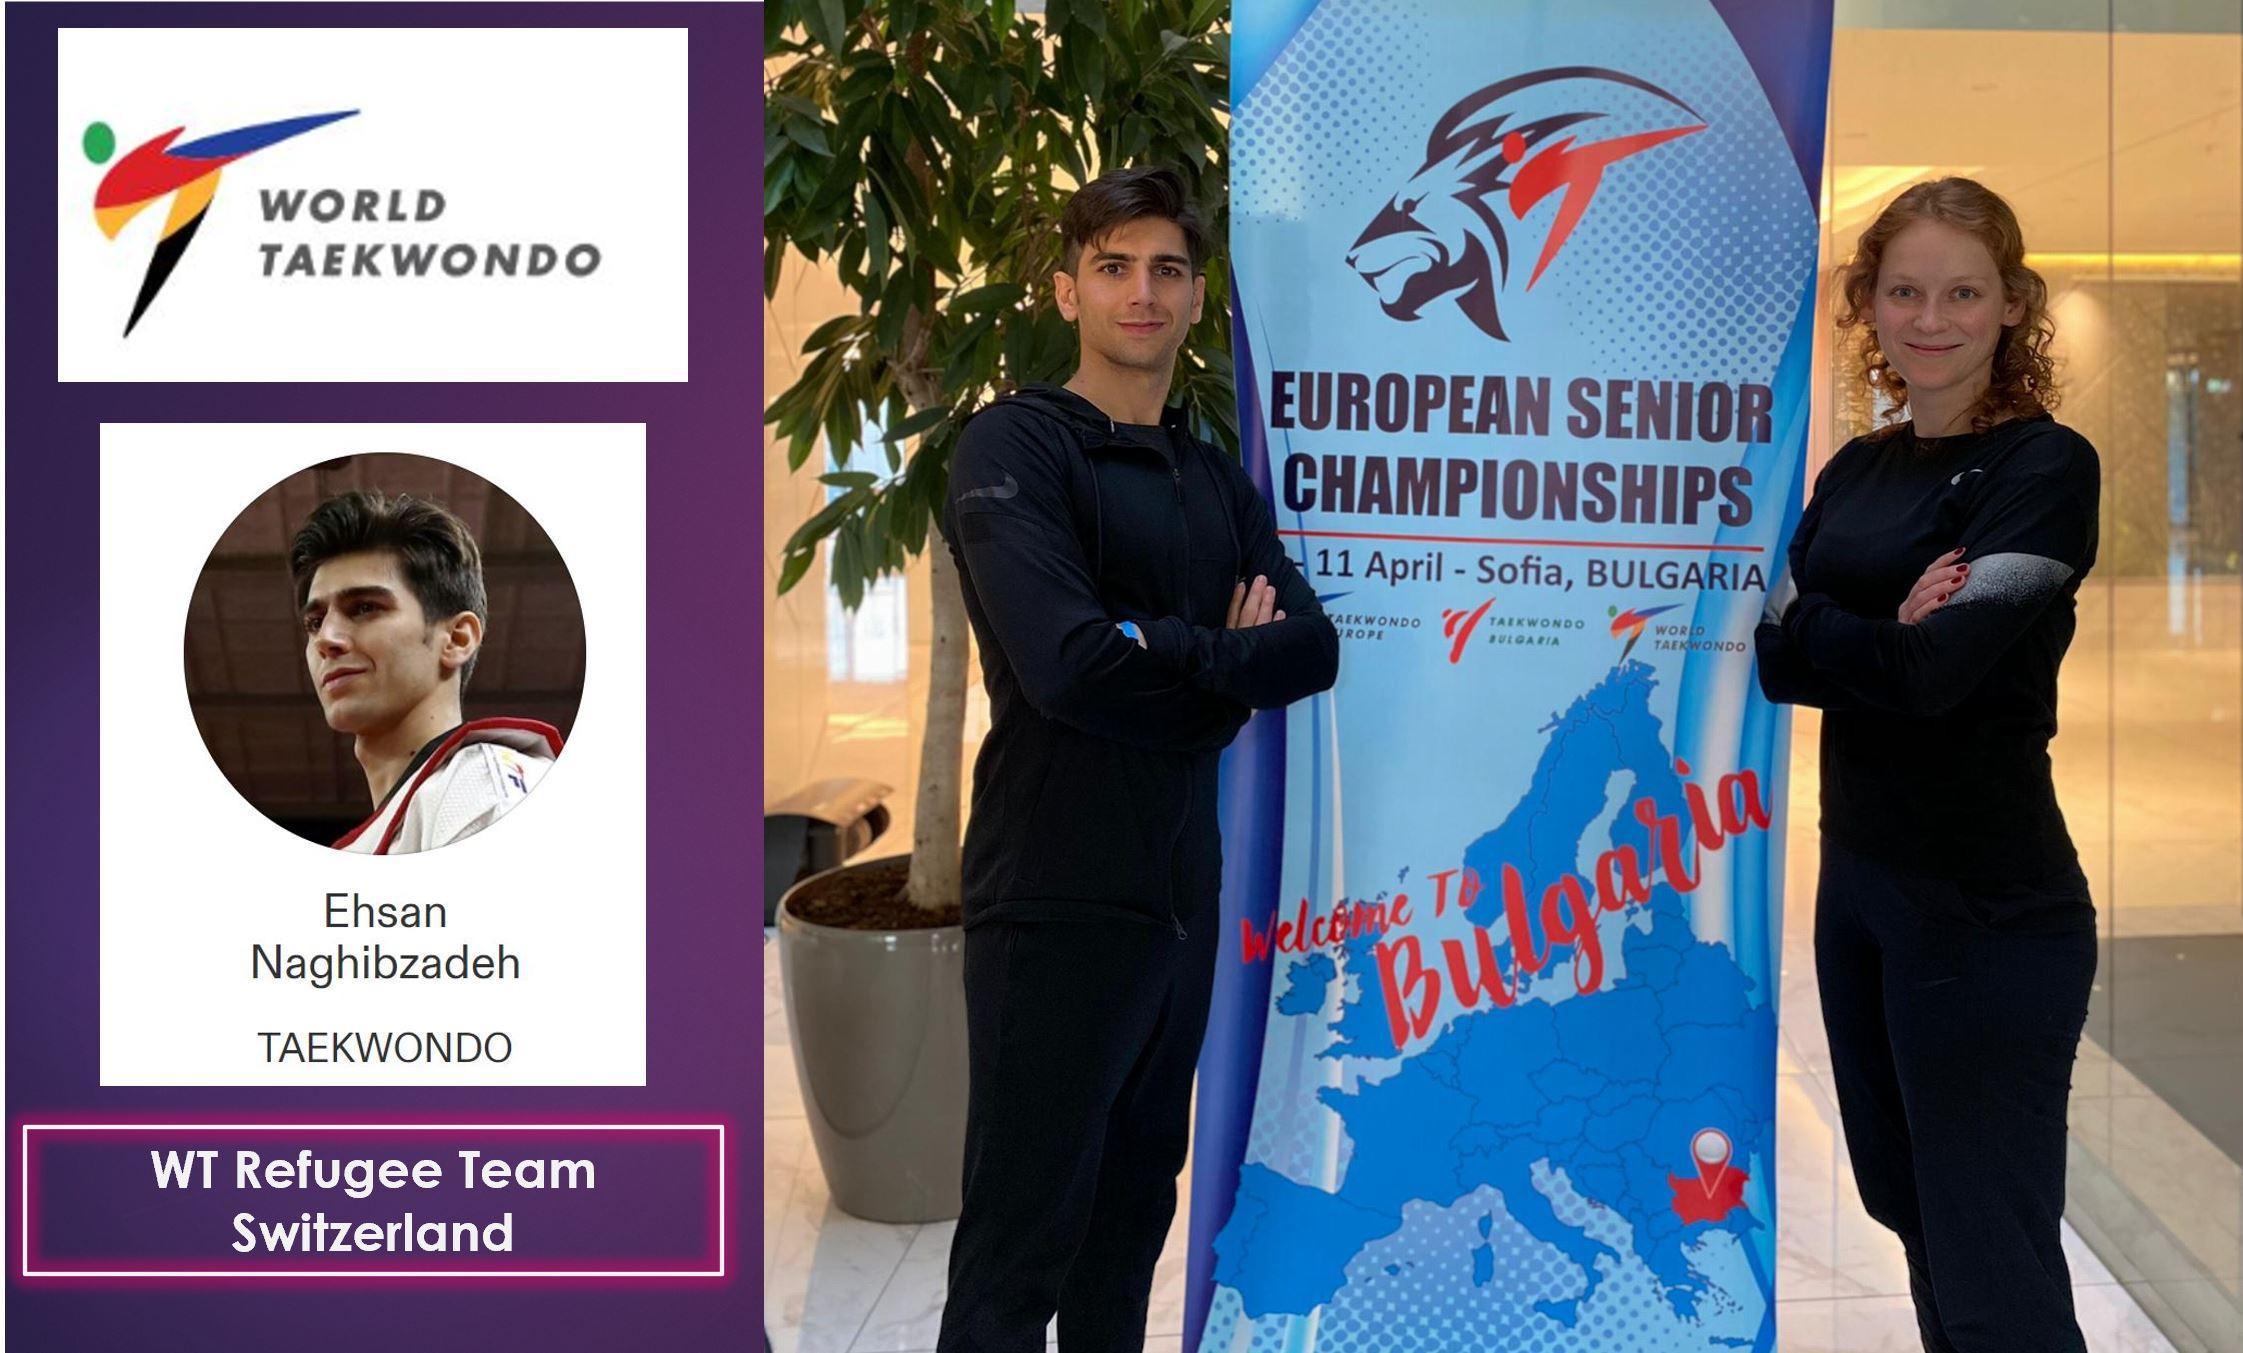 WT Refugee Team Switzerland : European Seniors Taekwondo Championships – Sofia, Bulgaria – 08-11.04.2021